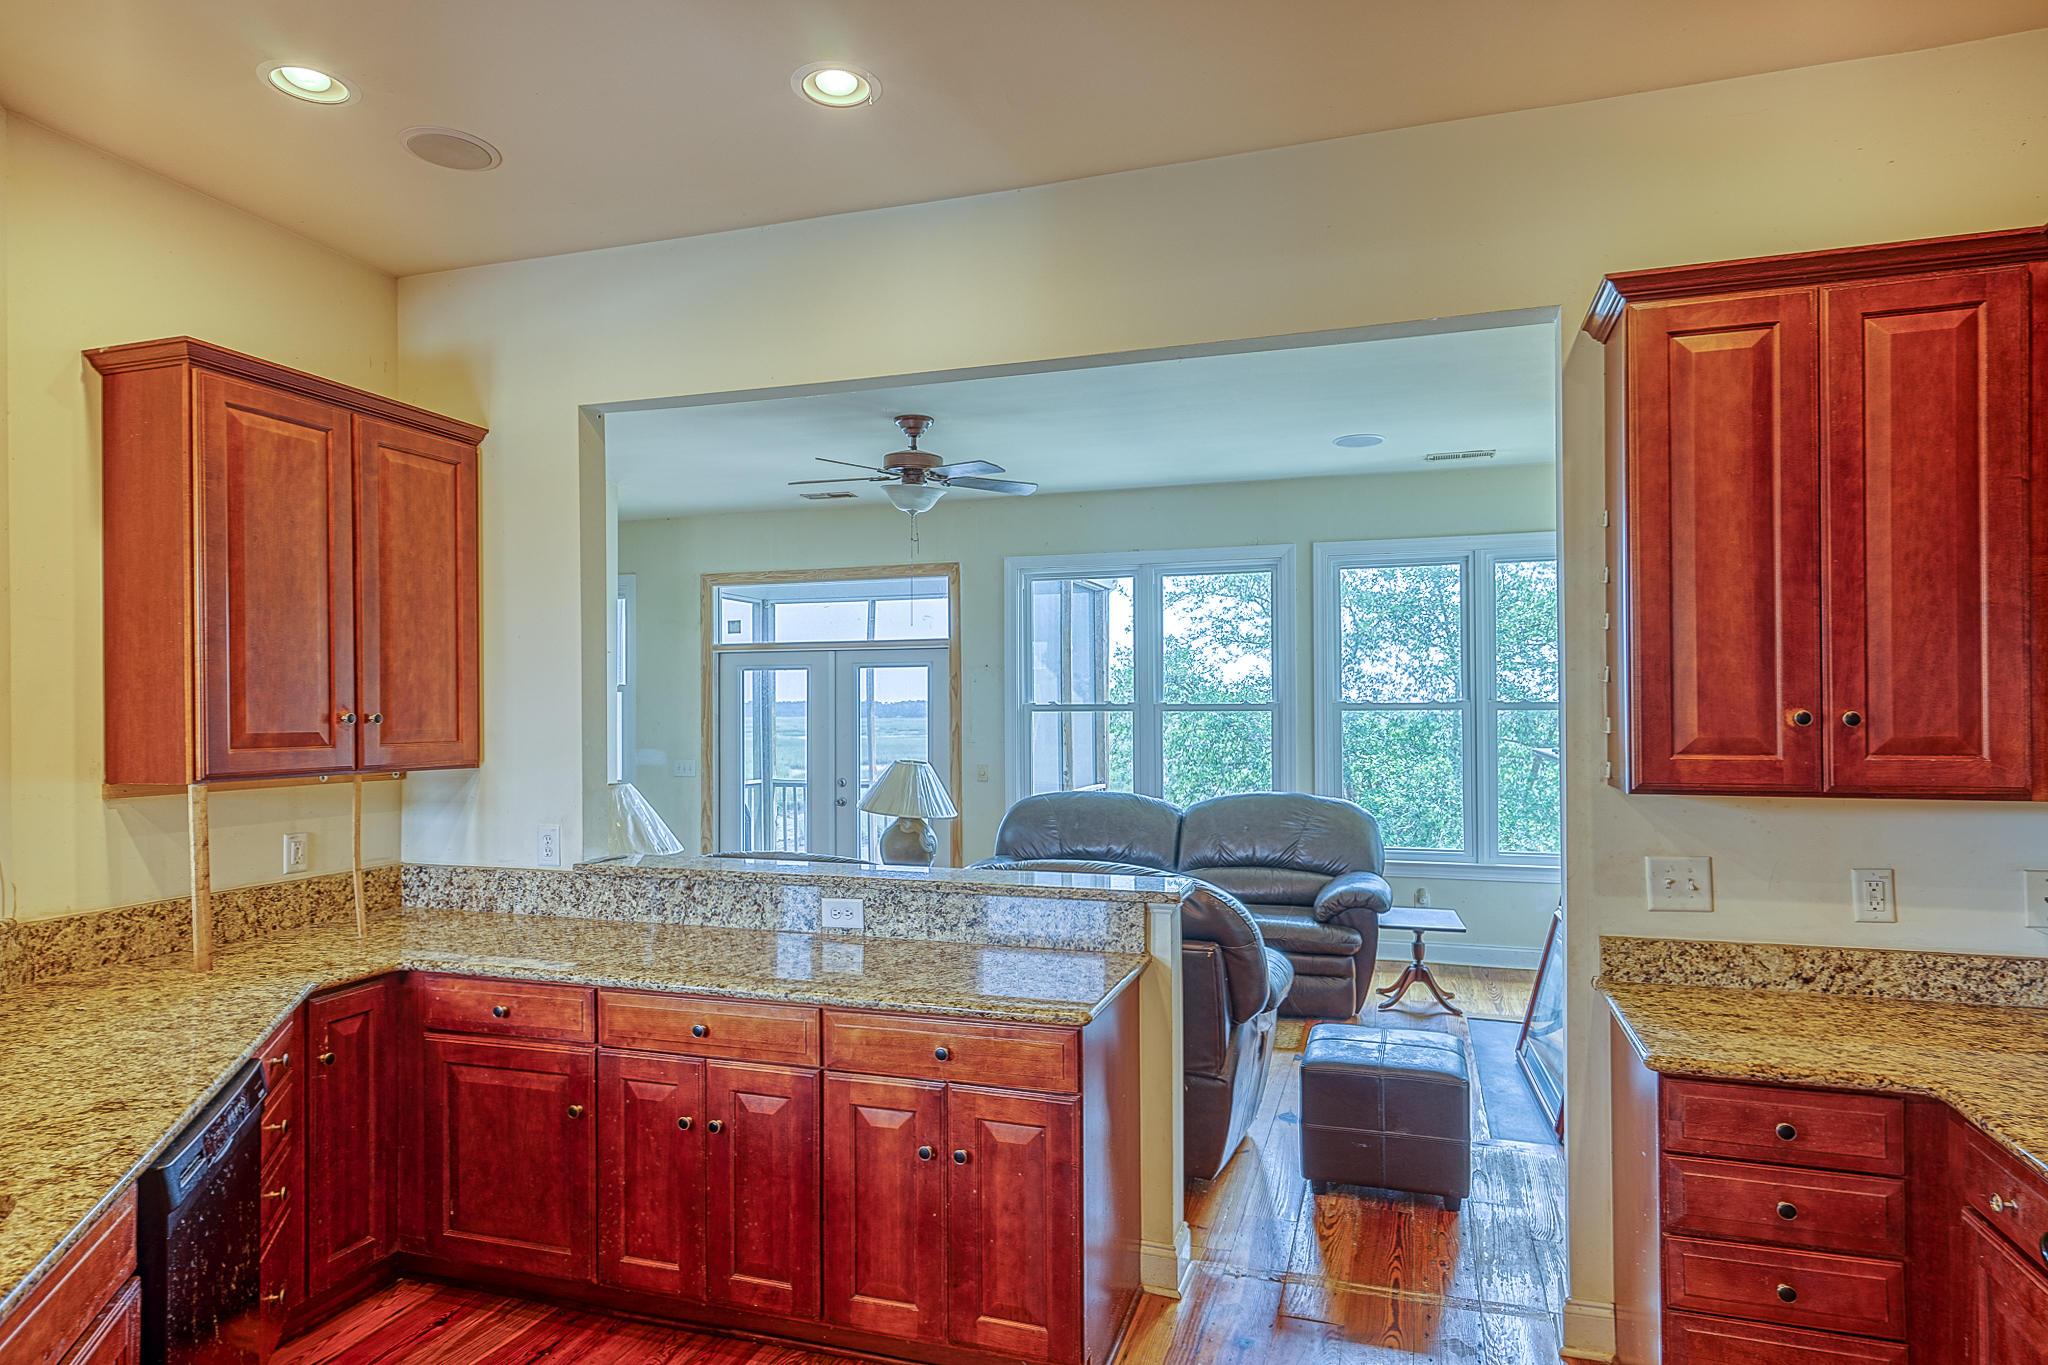 Folly Creek Place Homes For Sale - 2238 Folly Road, Folly Beach, SC - 1